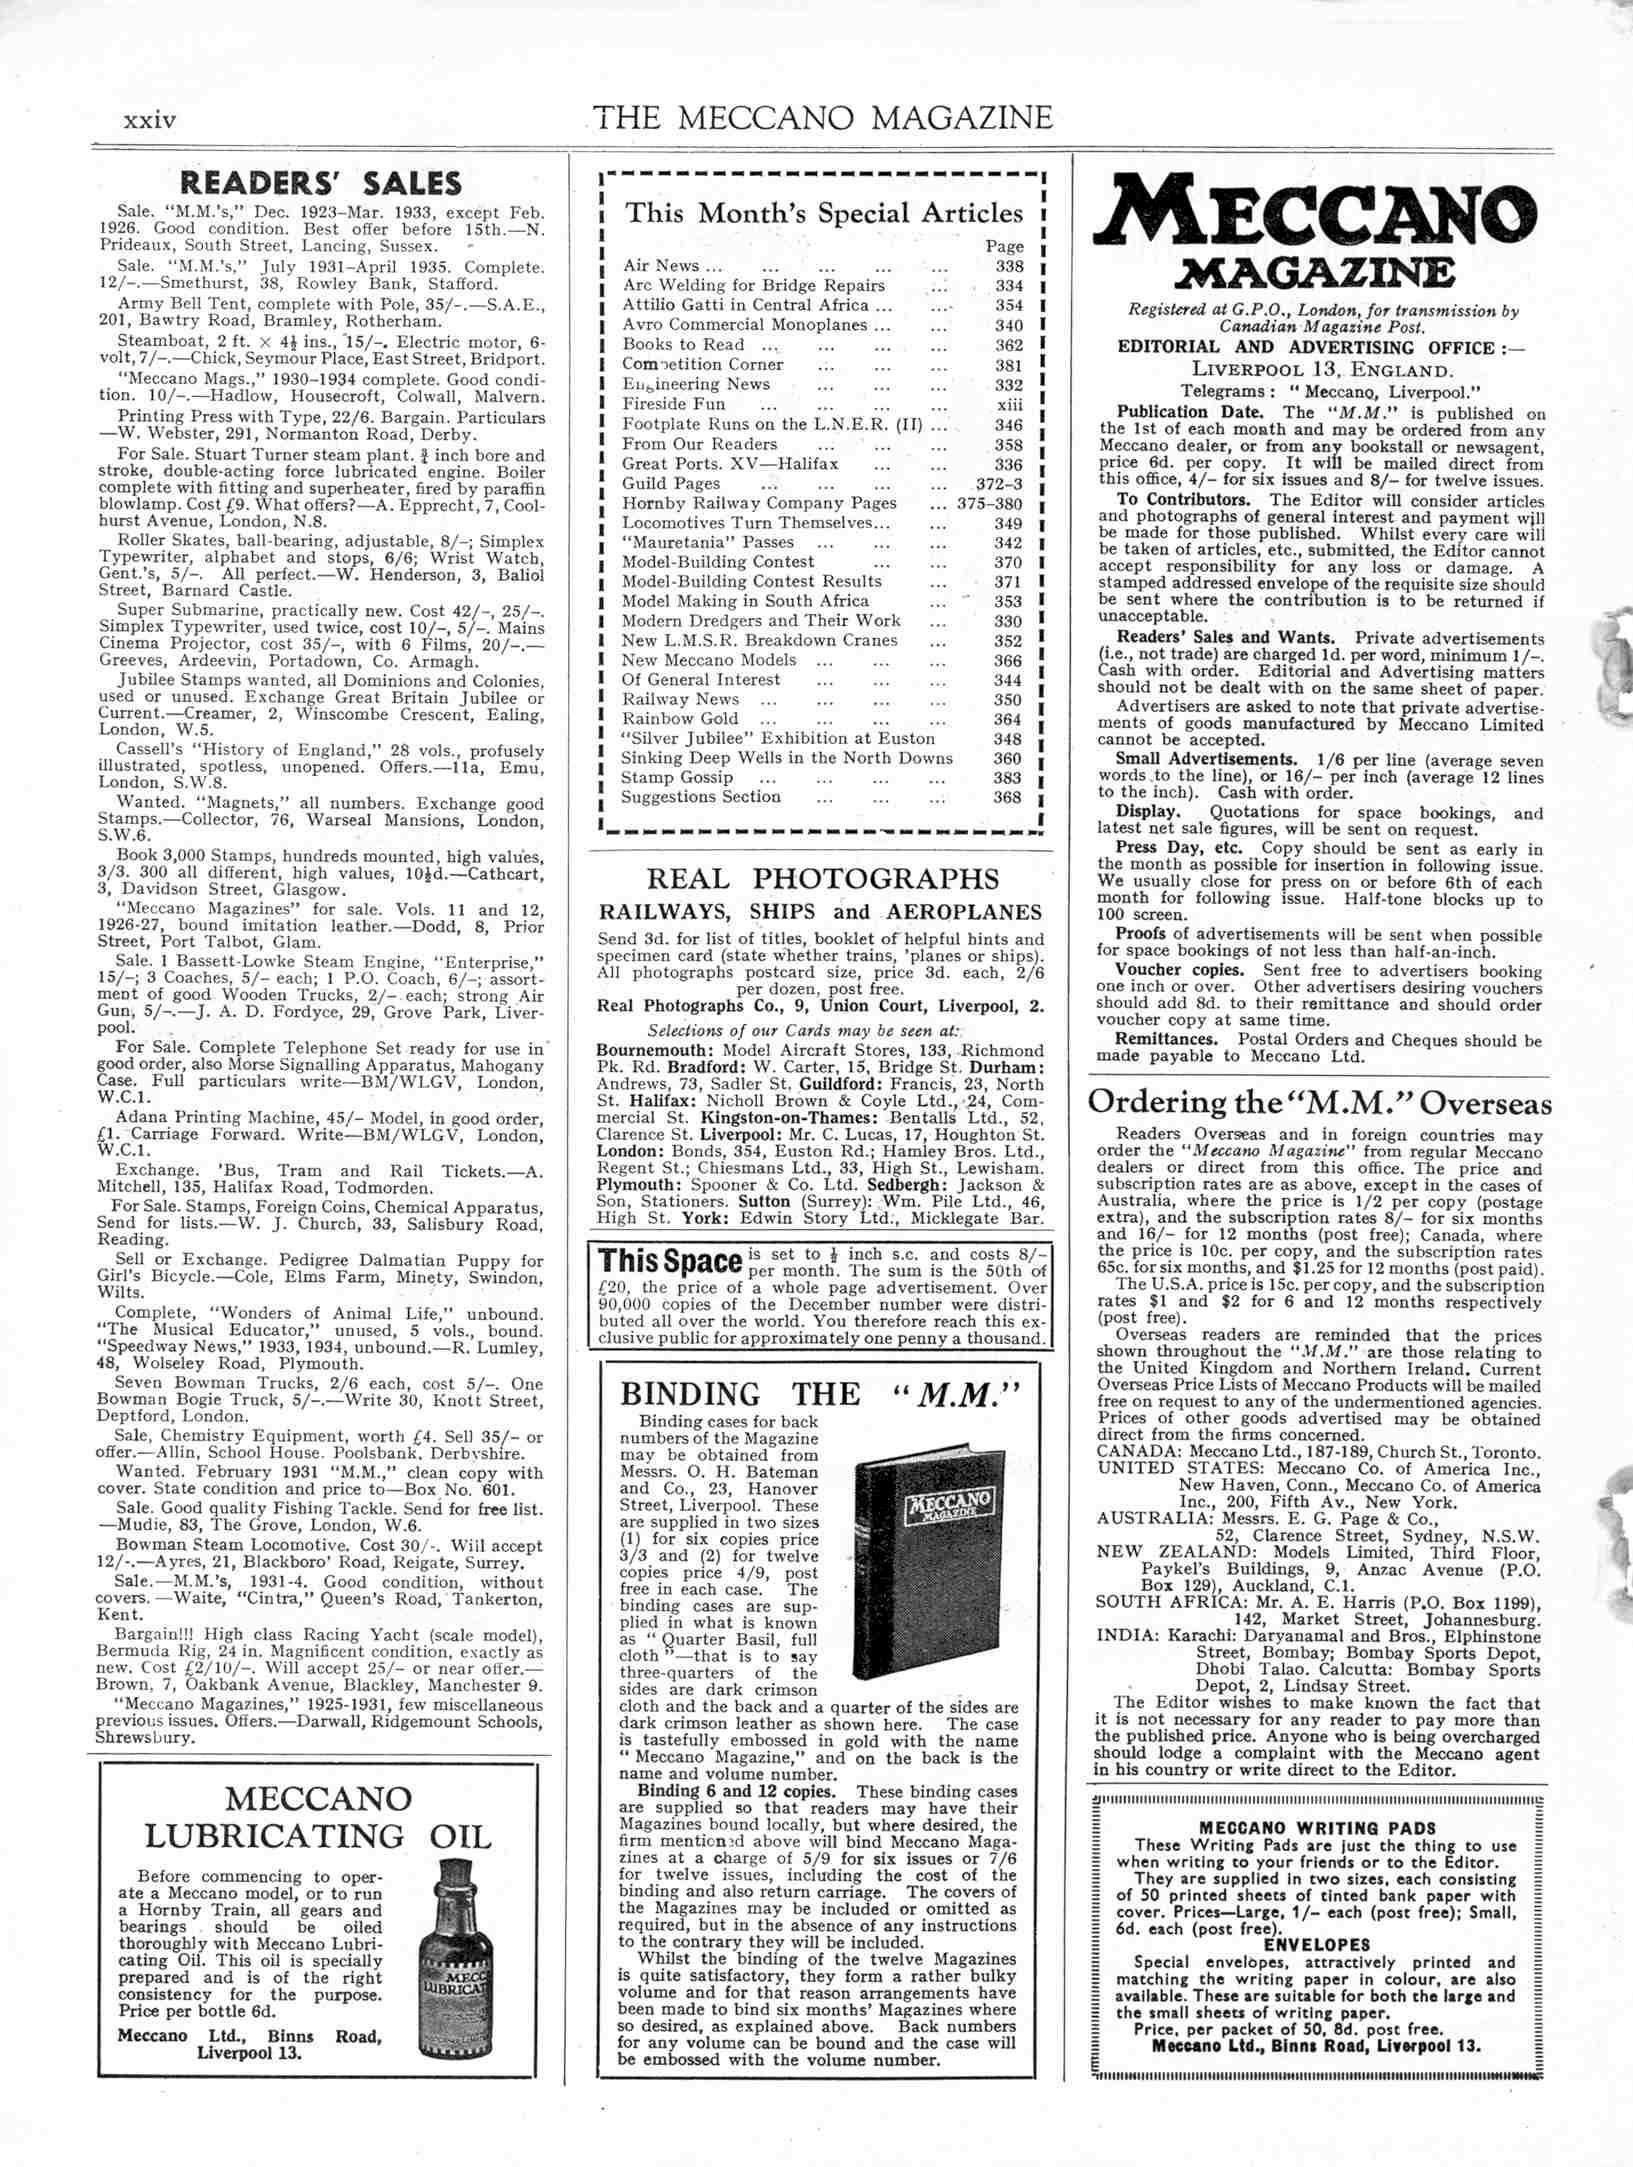 UK Meccano Magazine June 1935 Page xxiv